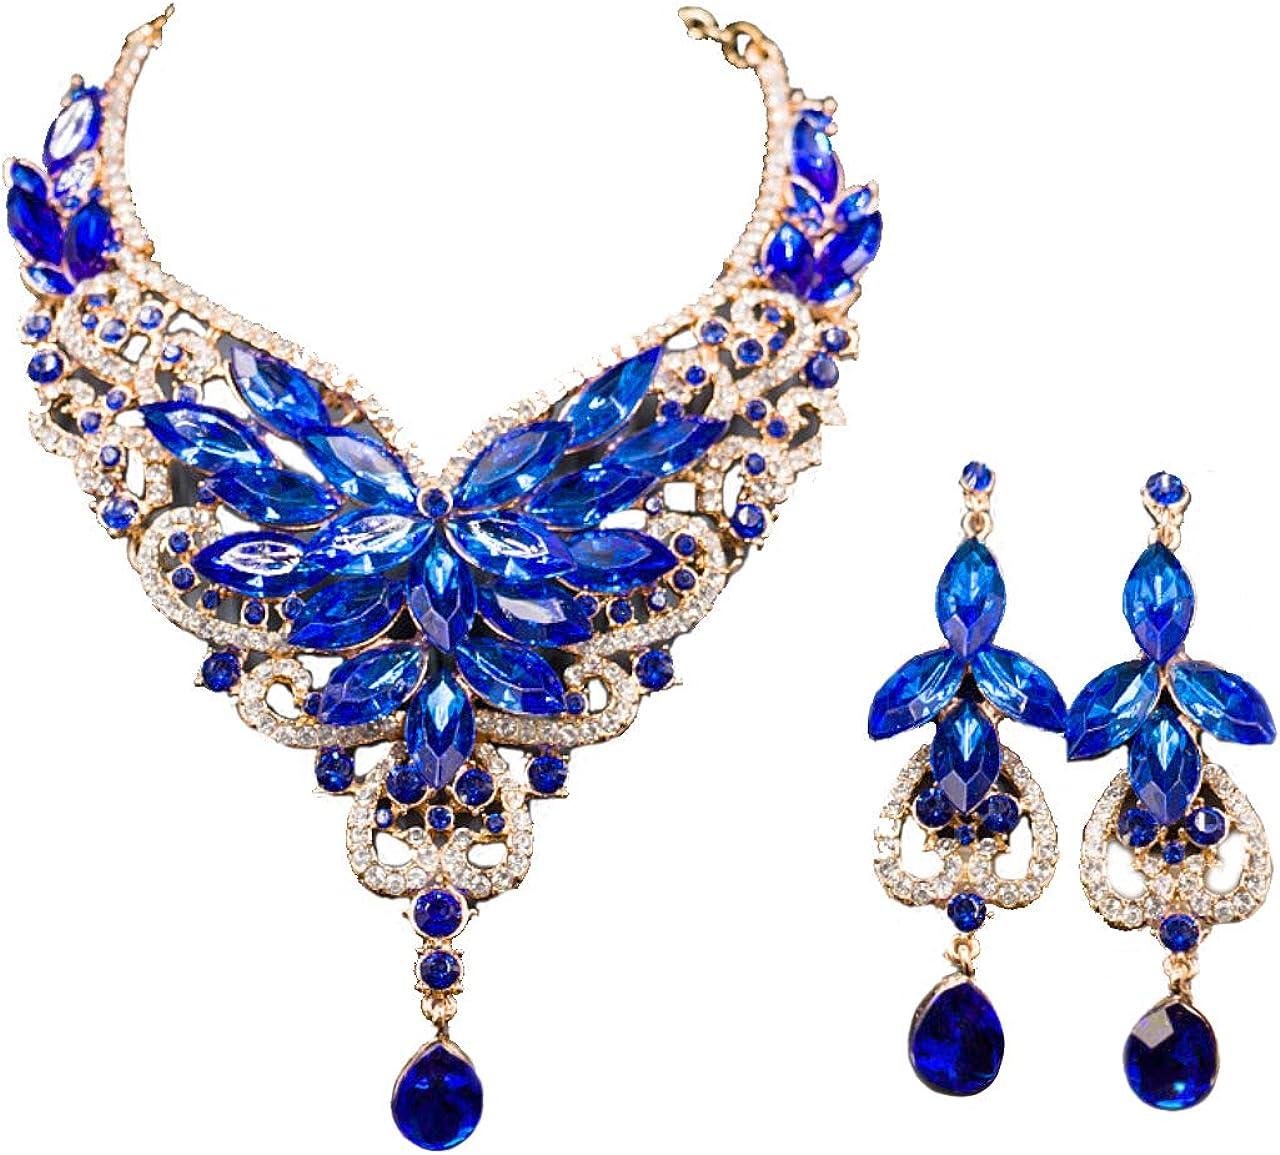 Luxury Chunky Bib Collar Crystal Statement Necklace and Dangle Earrings Wedding Jewelry Set